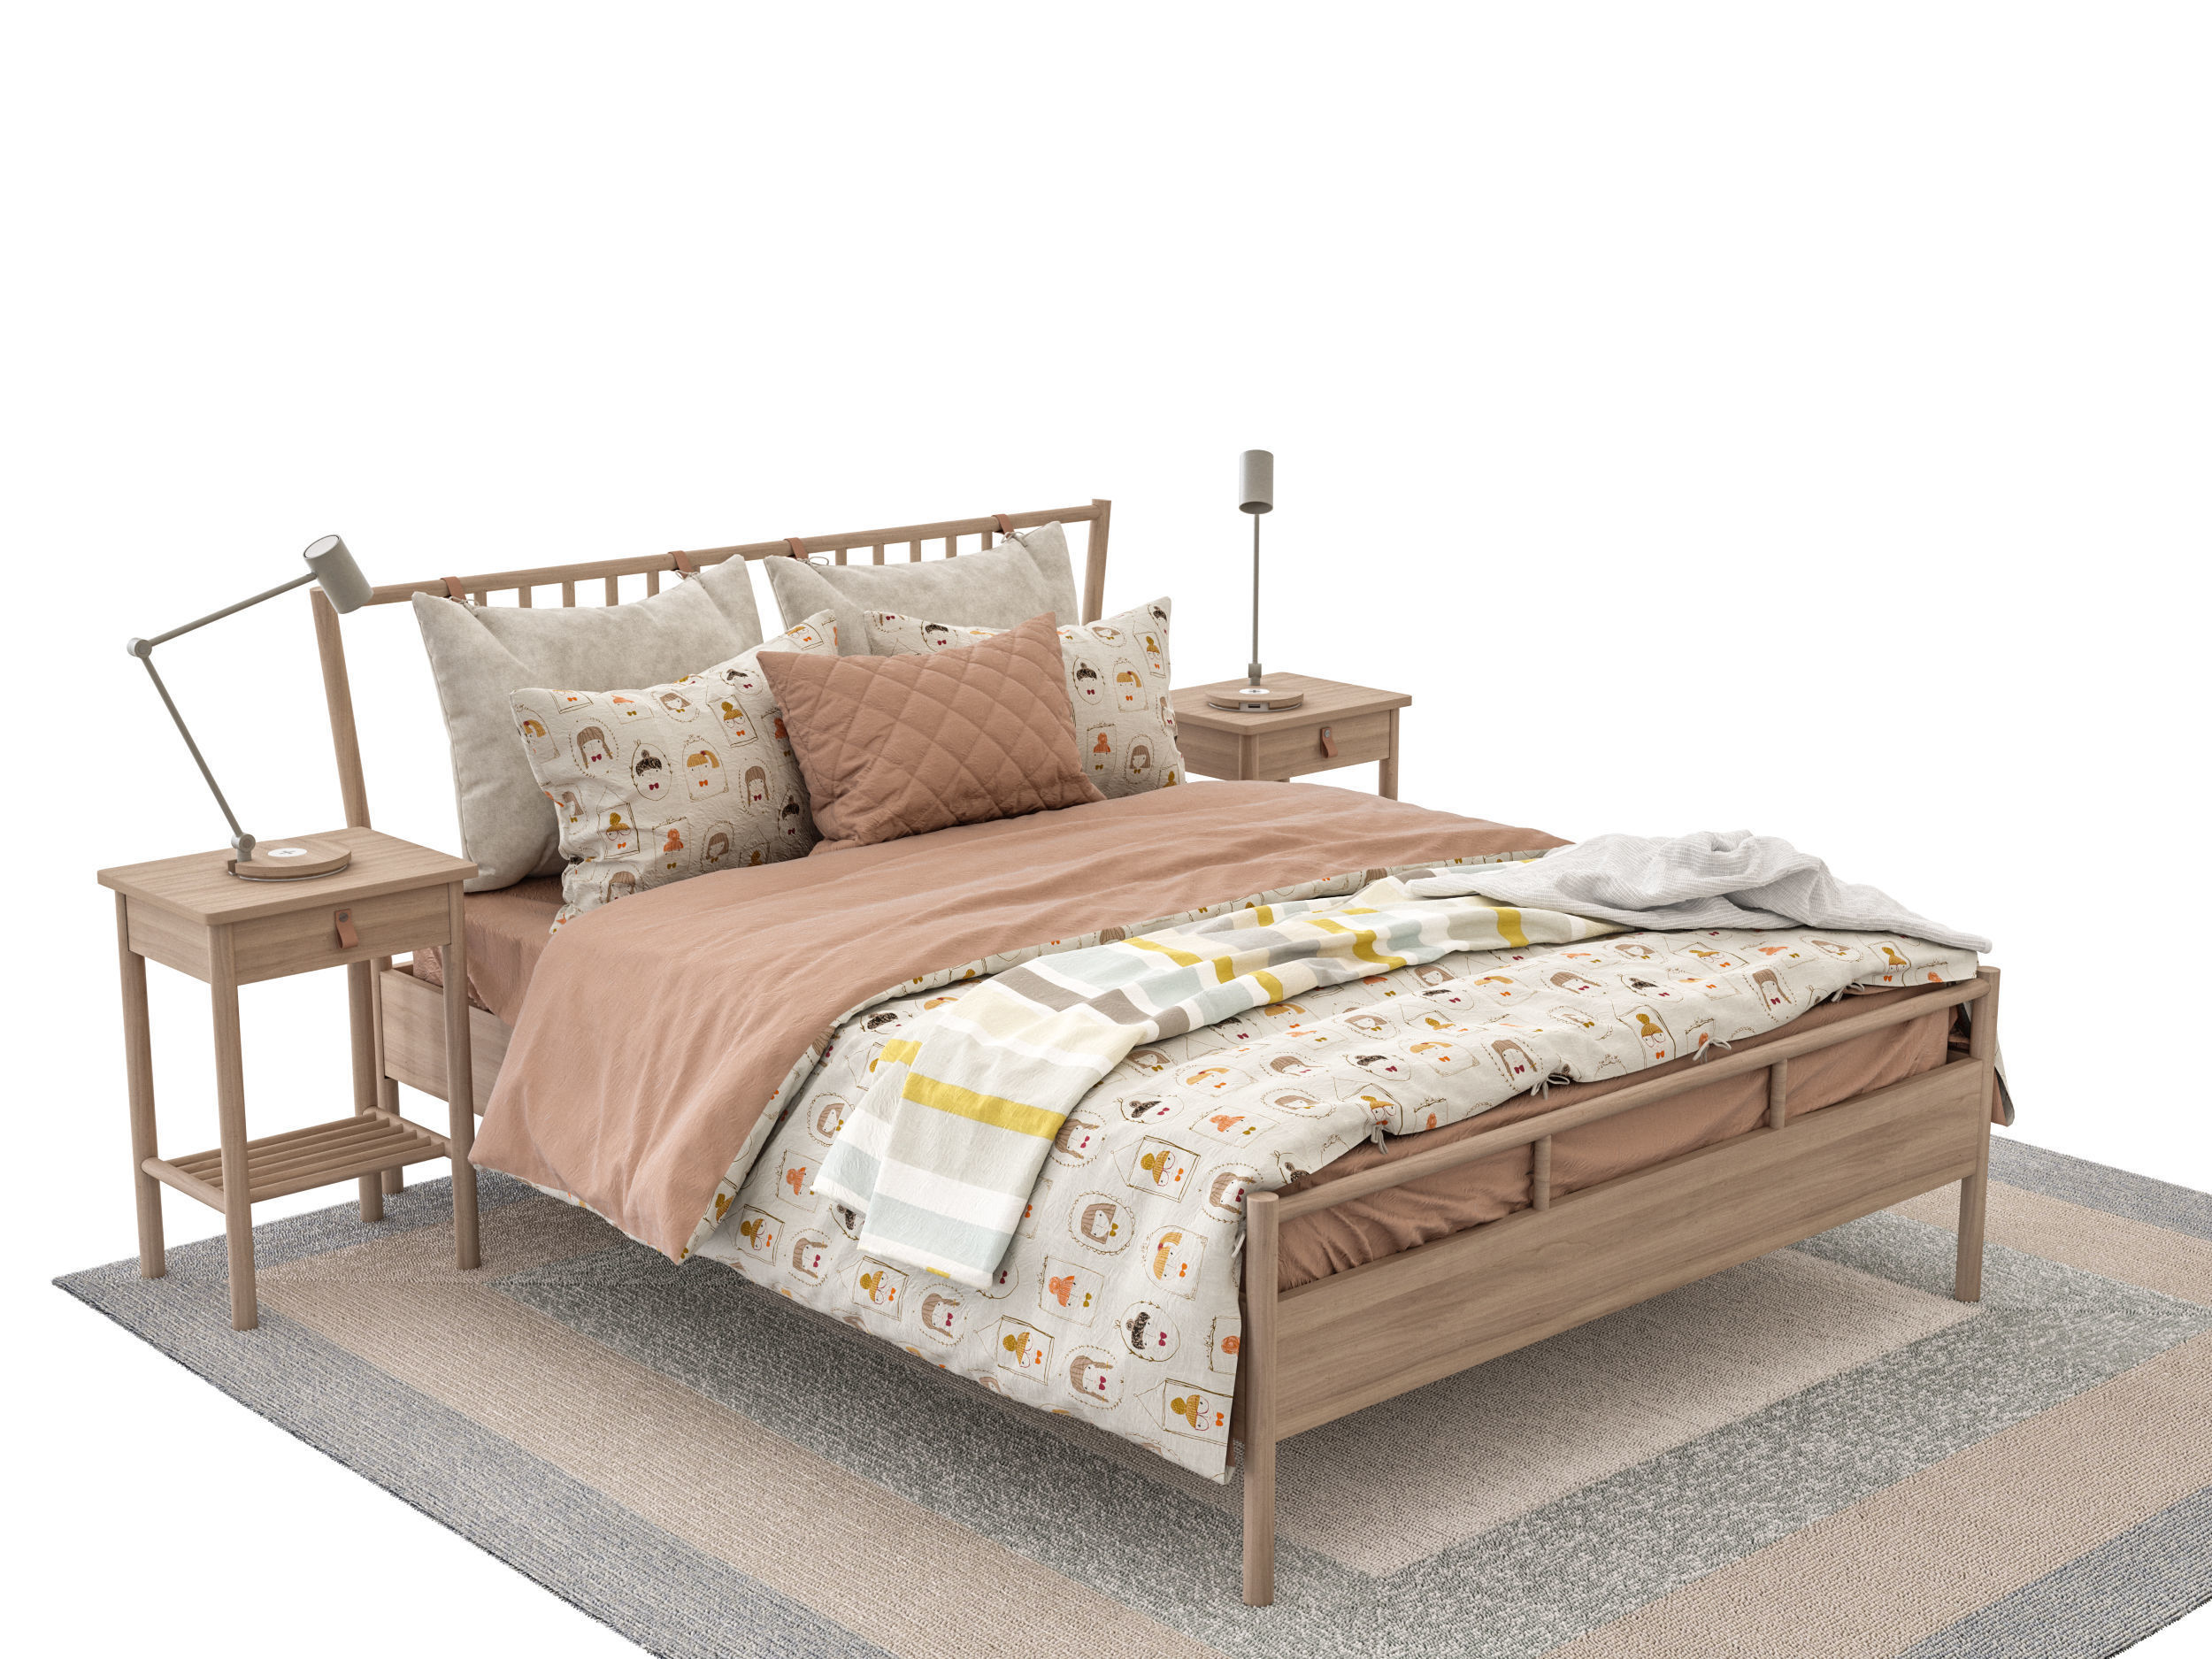 Ikea Bjorksnas Bed 3d Model Max Obj